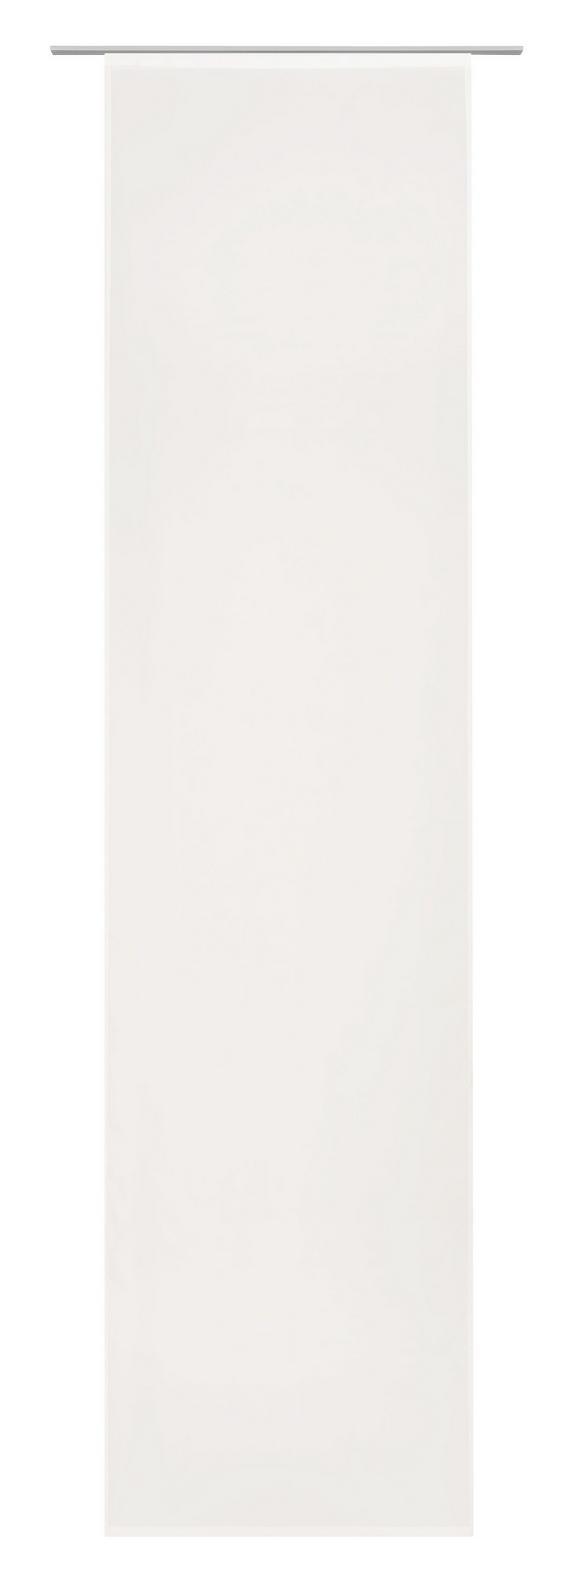 Panelna Zavesa Flipp - krem, tekstil (60/245cm) - Mömax modern living